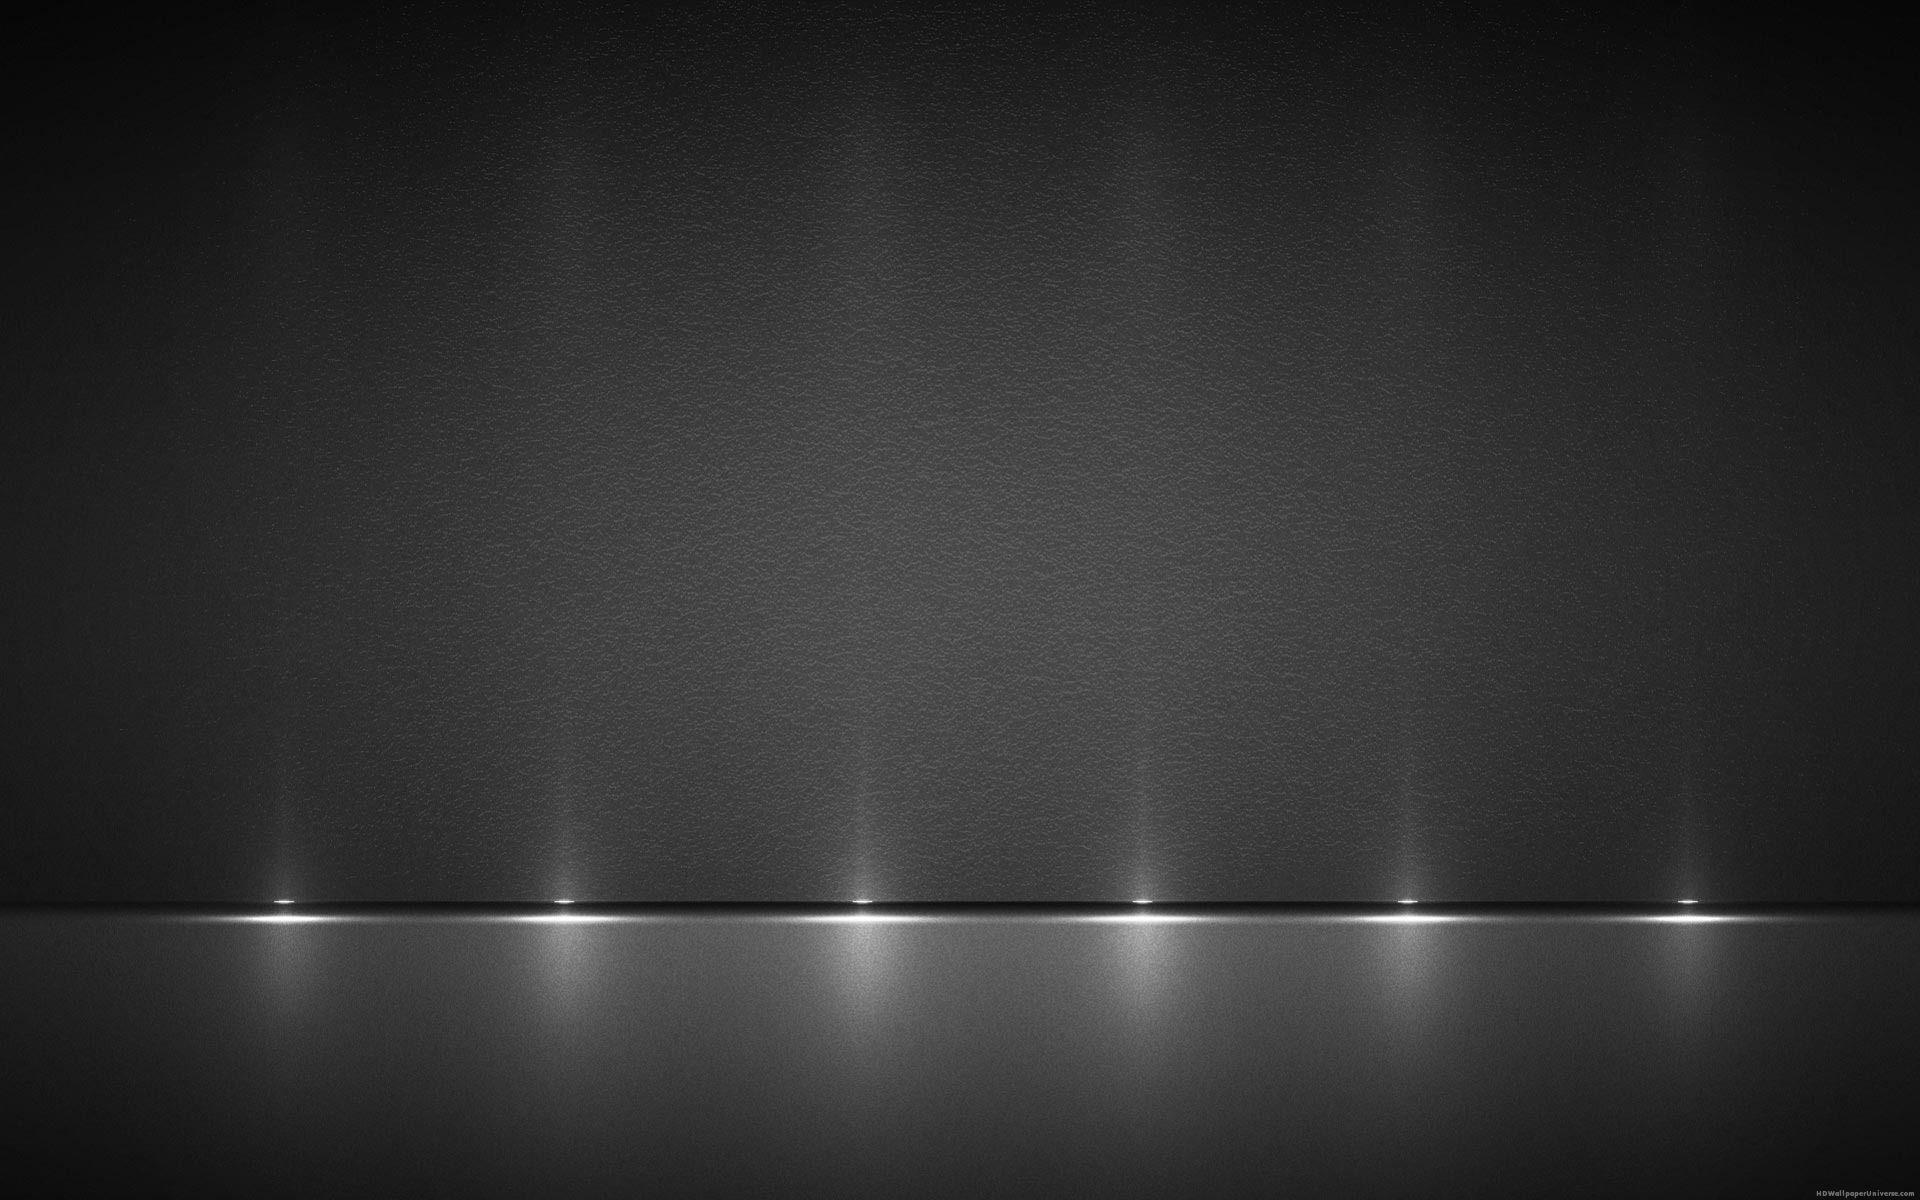 Stage lights on dark background HD Wallpaper http//www